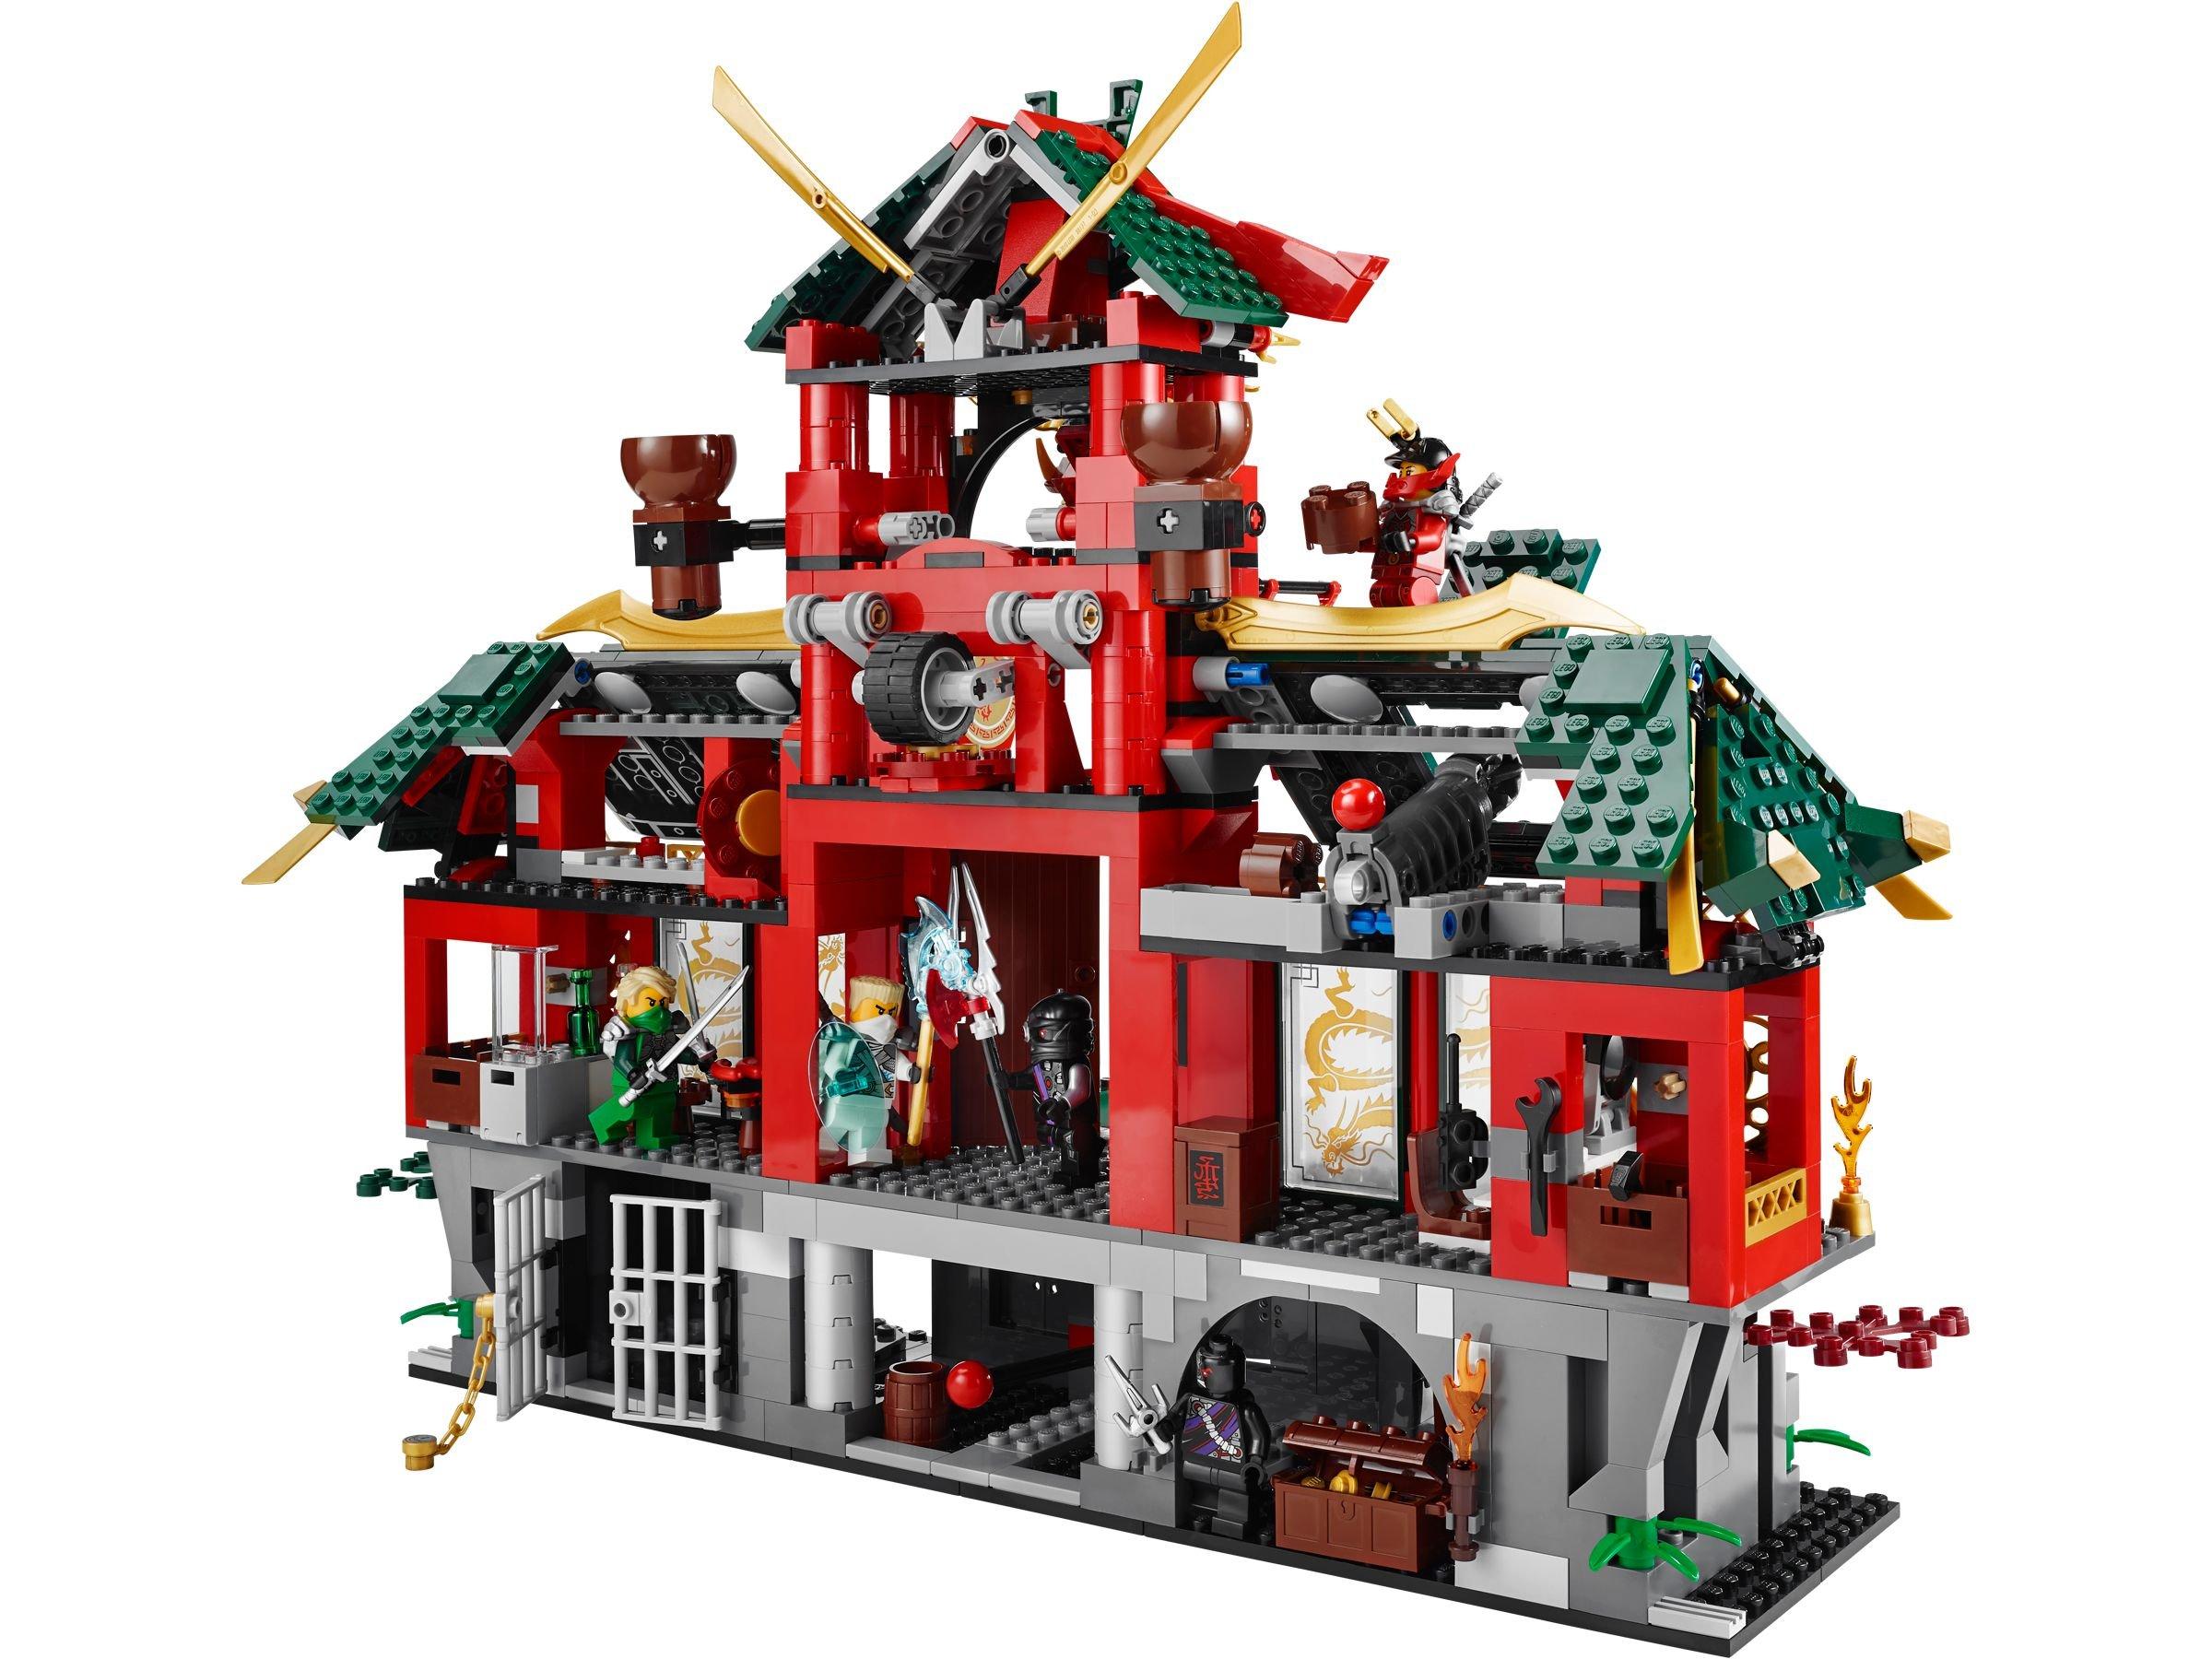 Lego 70728 ninjago city ninjago 2014 battle for ninjago city brickmerge - Photo lego ninjago ...